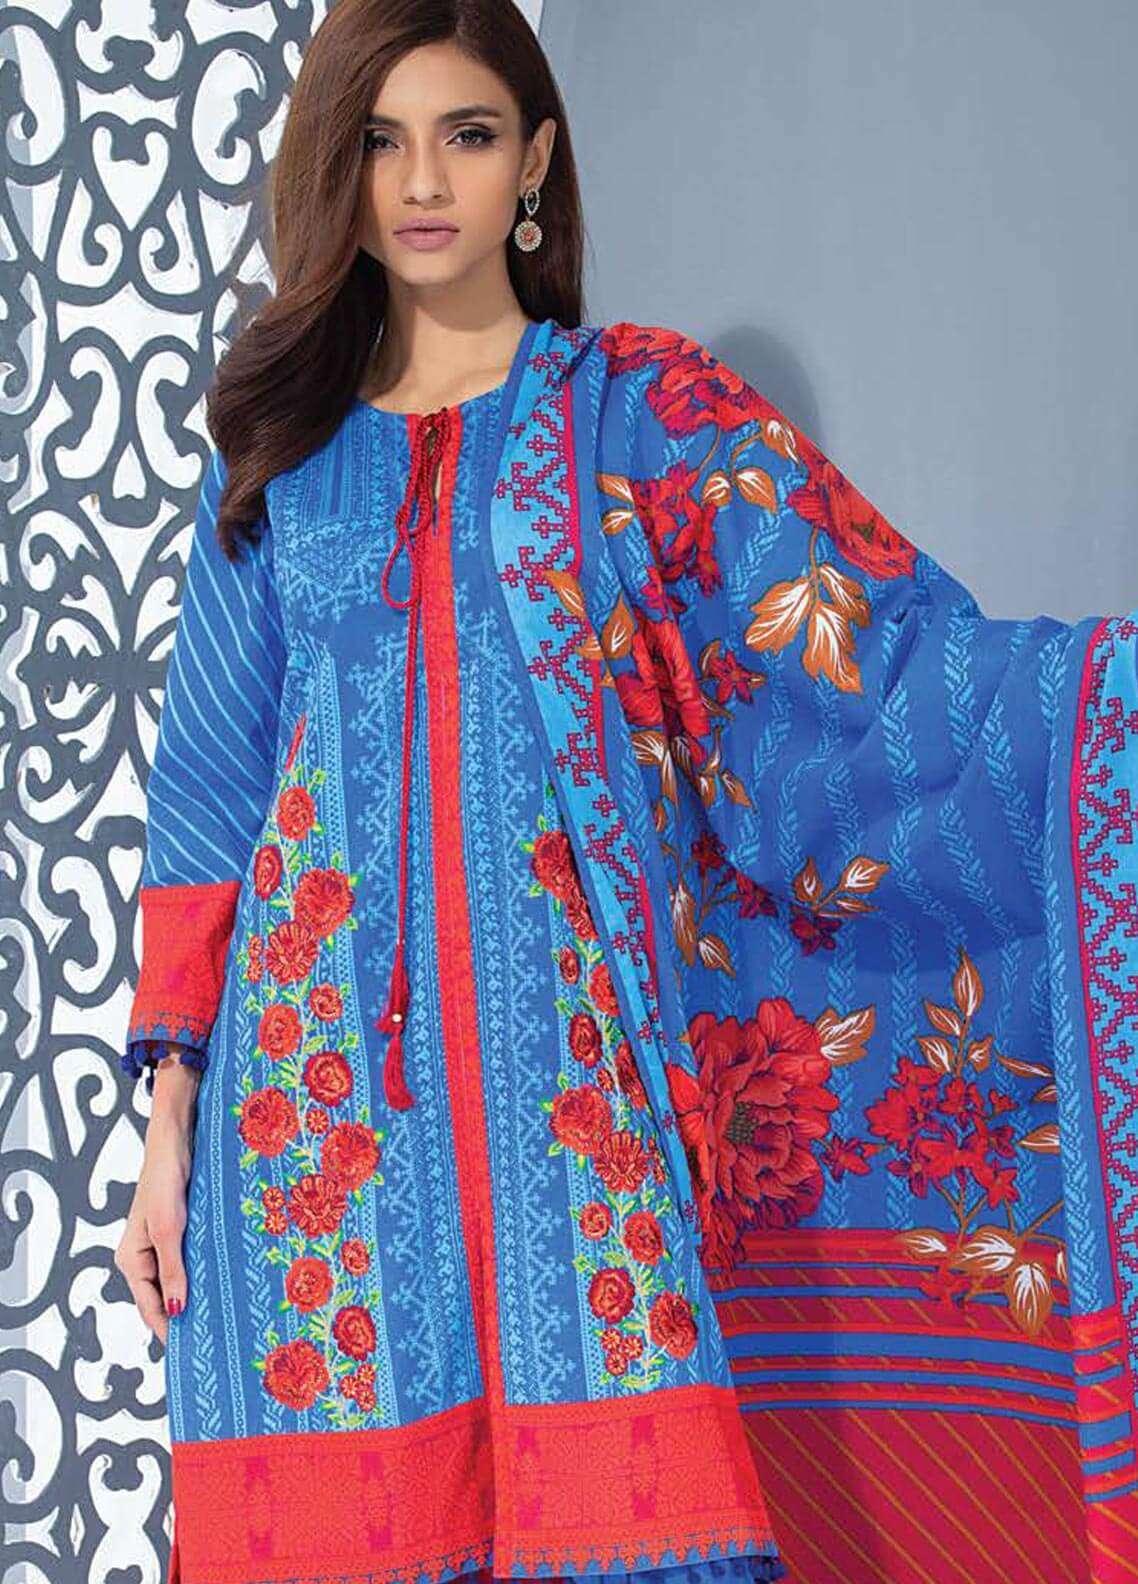 Orient Textile Embroidered Karandi Unstitched 3 Piece Suit OT18W 236B Persia - Winter Collection